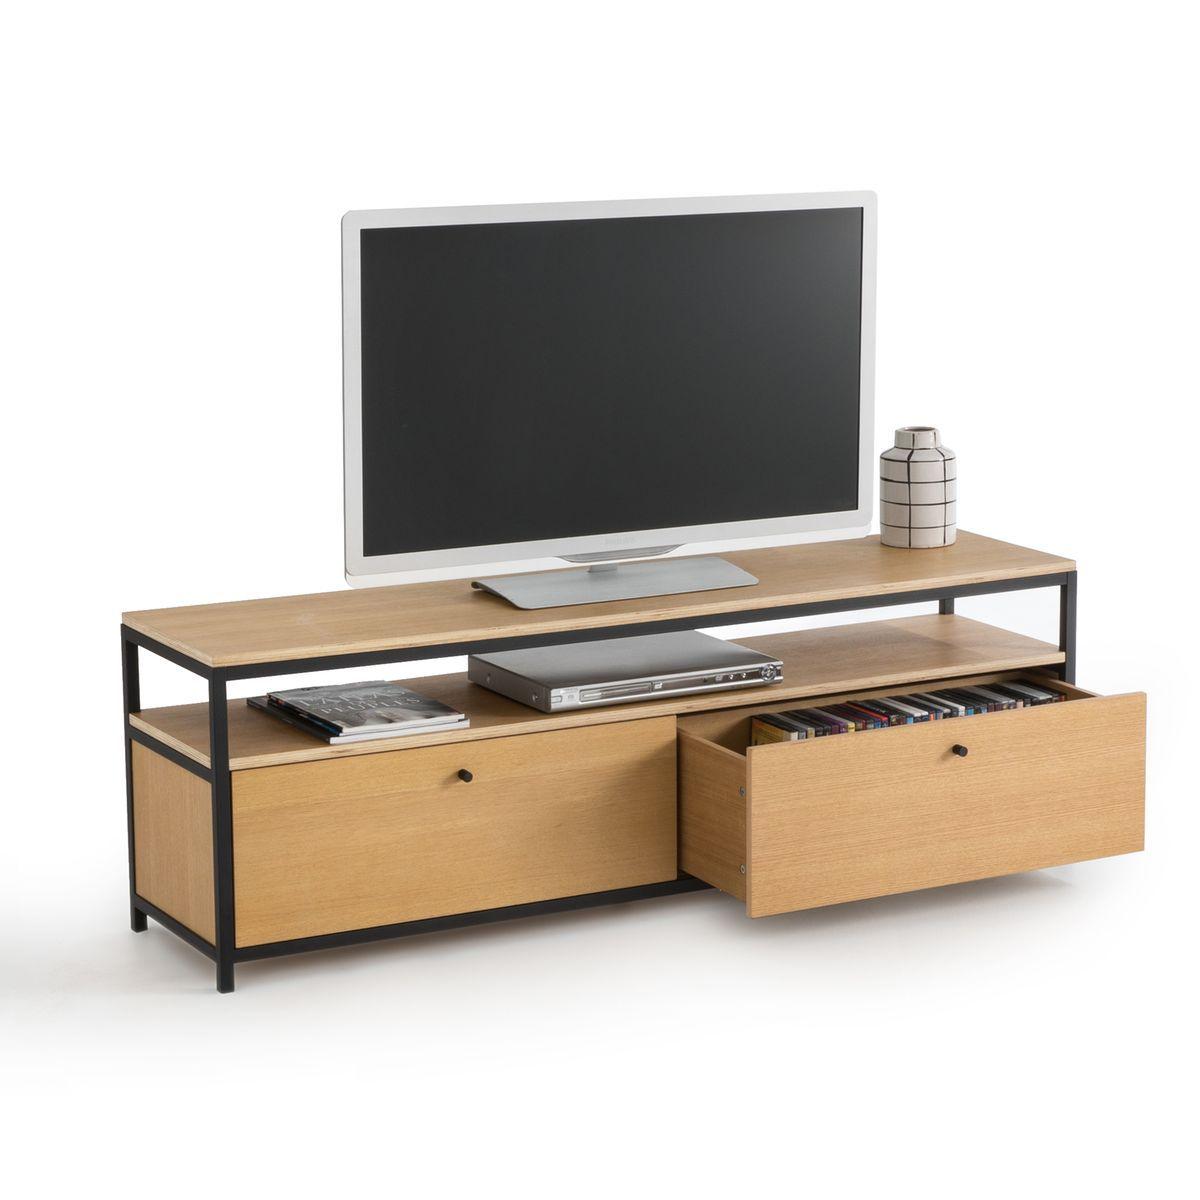 Meuble Tv Grande Taille banc tv 160 cm, talist | banc tv, grande niche et grands tiroirs